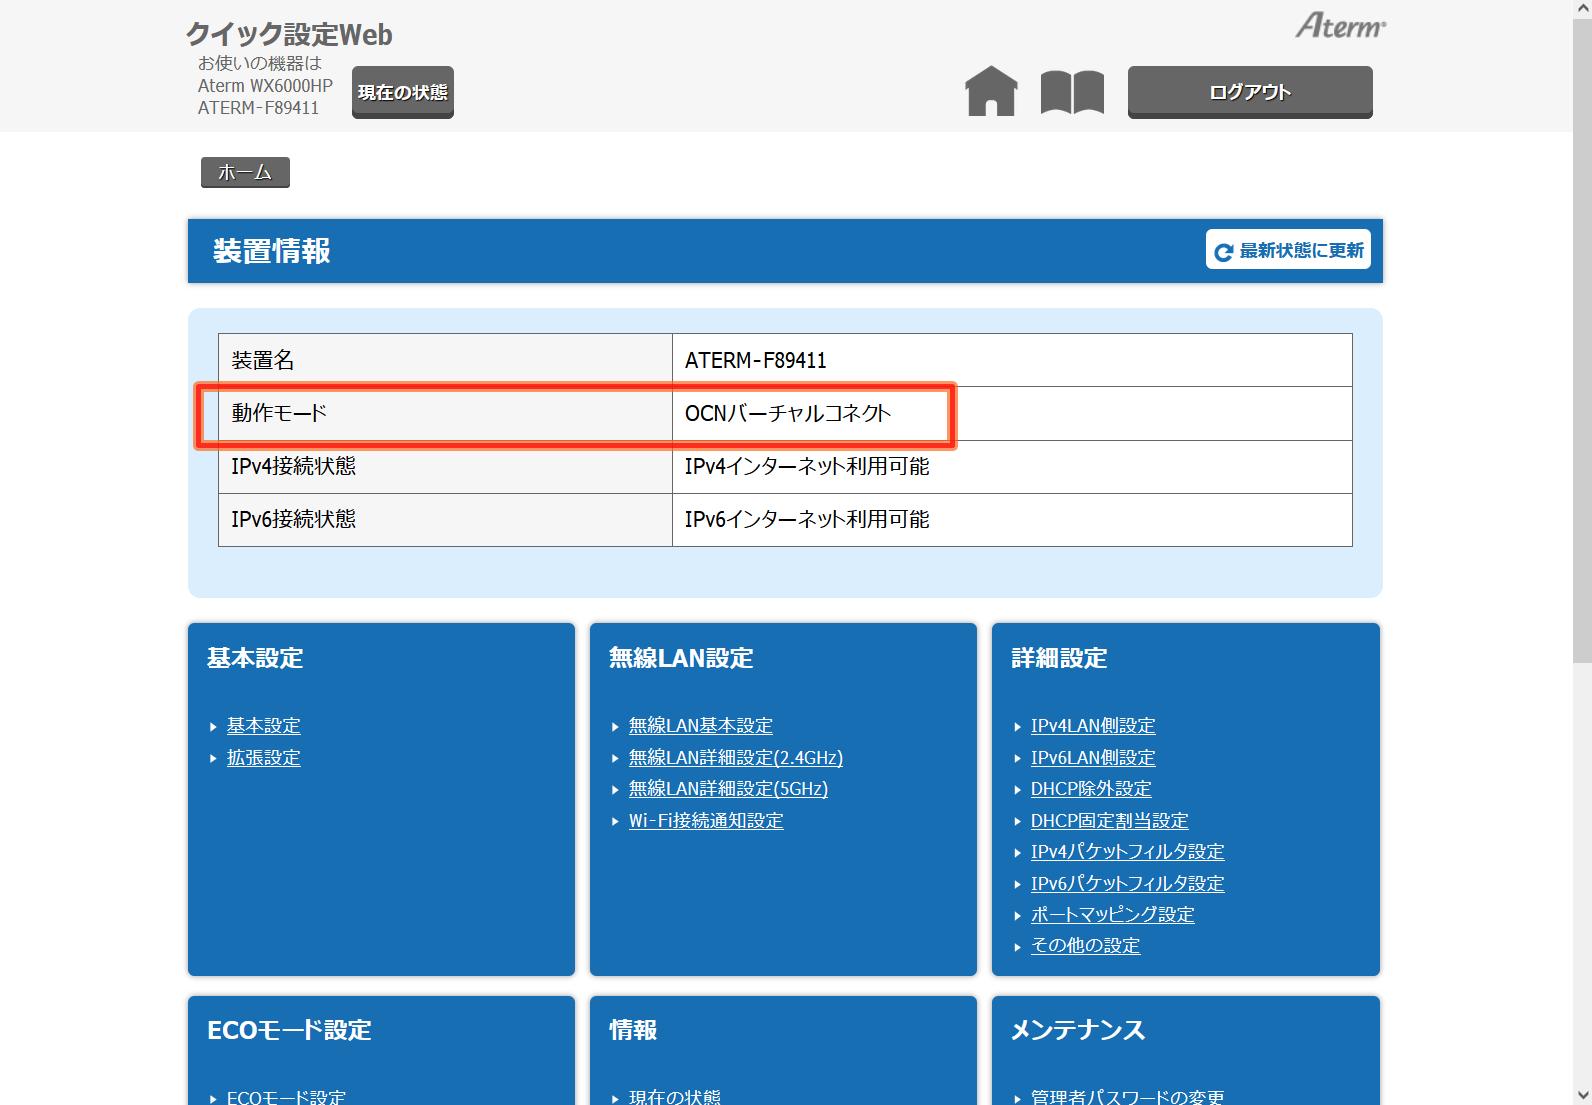 Aterm WX6000HP_settings_ipoe_3